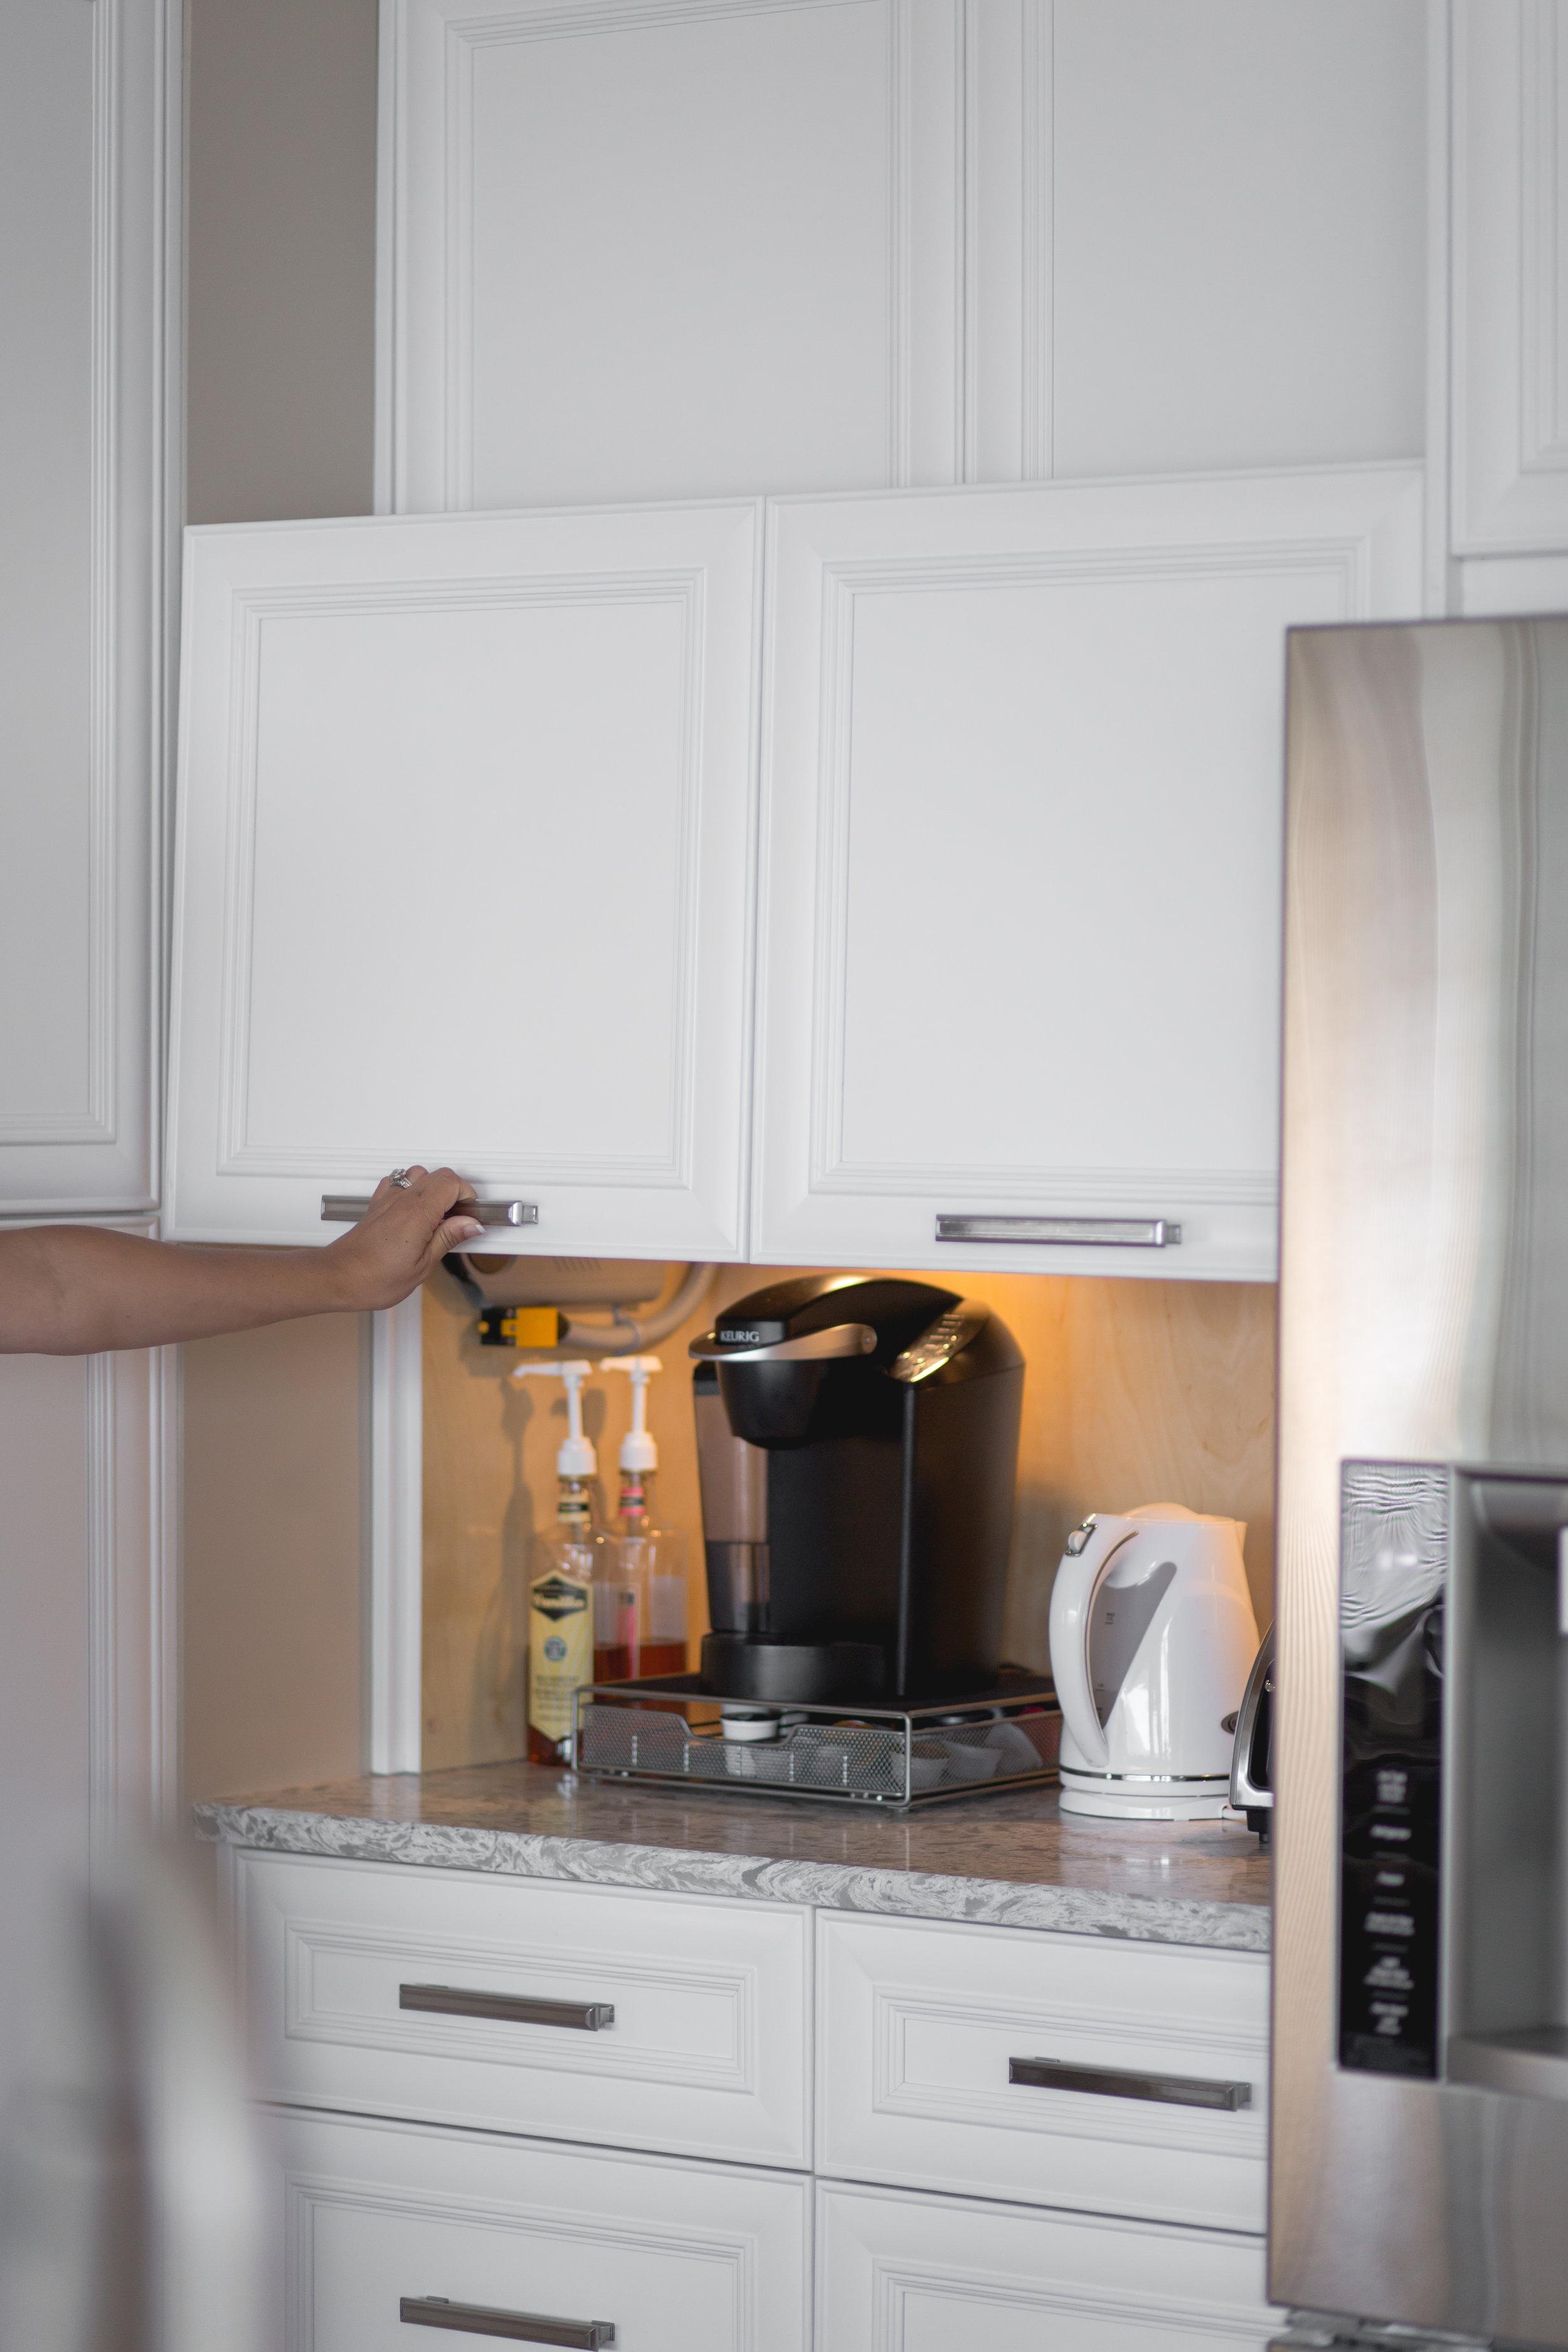 Copy of sutherland_WEB_kitchen_living-26.jpg